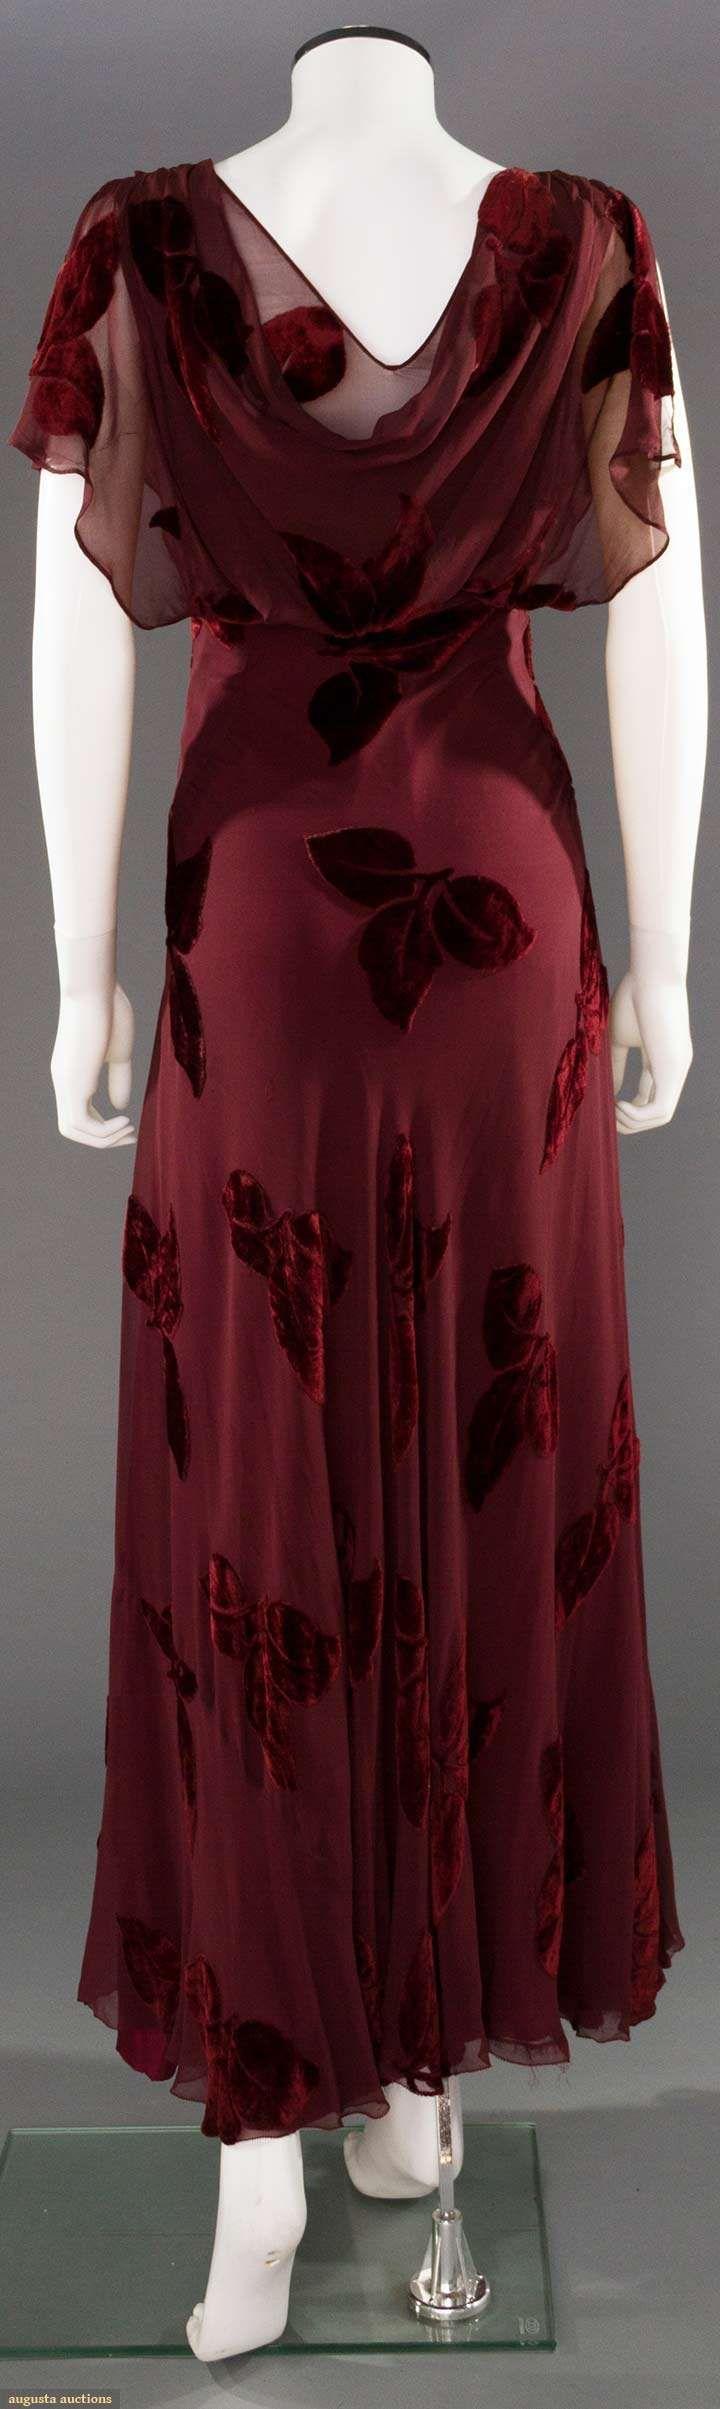 CUT VELVET EVENING GOWN, 1930s Cranberry leaves cut to chiffon, bias cut w/ matching silk slip More